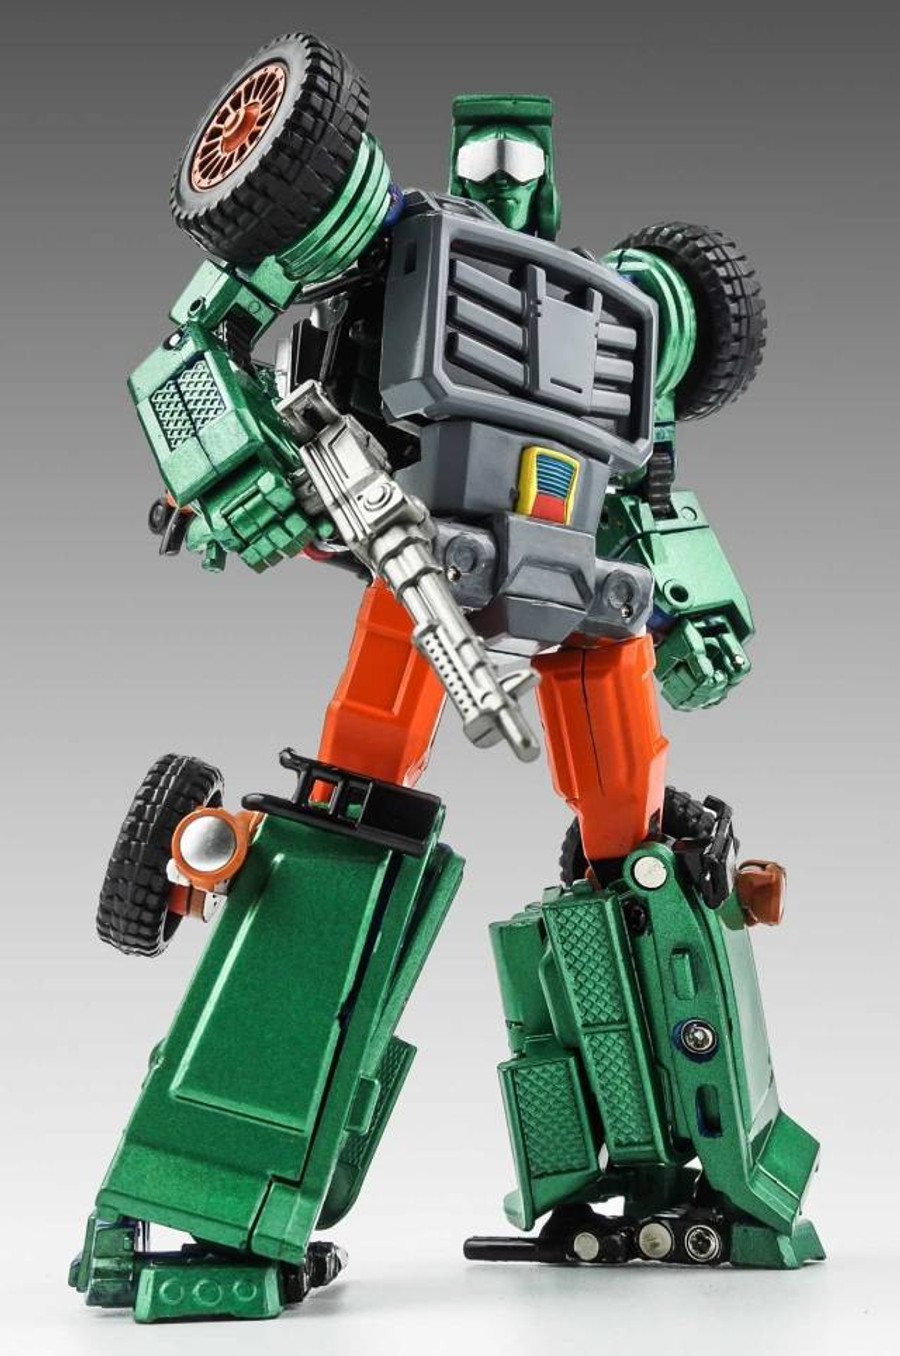 X-Transbots - MM-VIII-G2 Arkose - Green Version Limited Edition